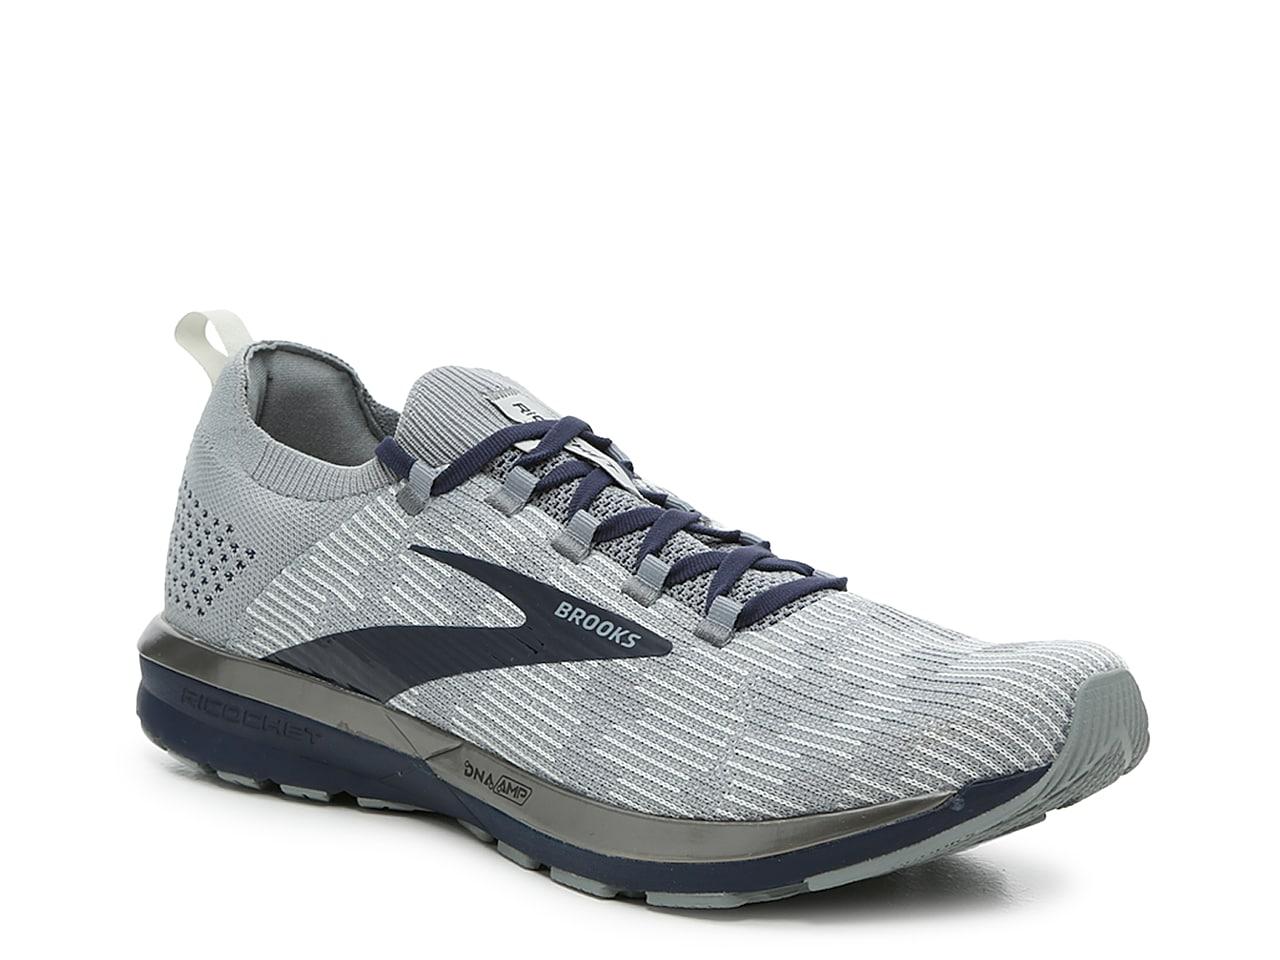 Ricochet 2 Running Shoe - Men's